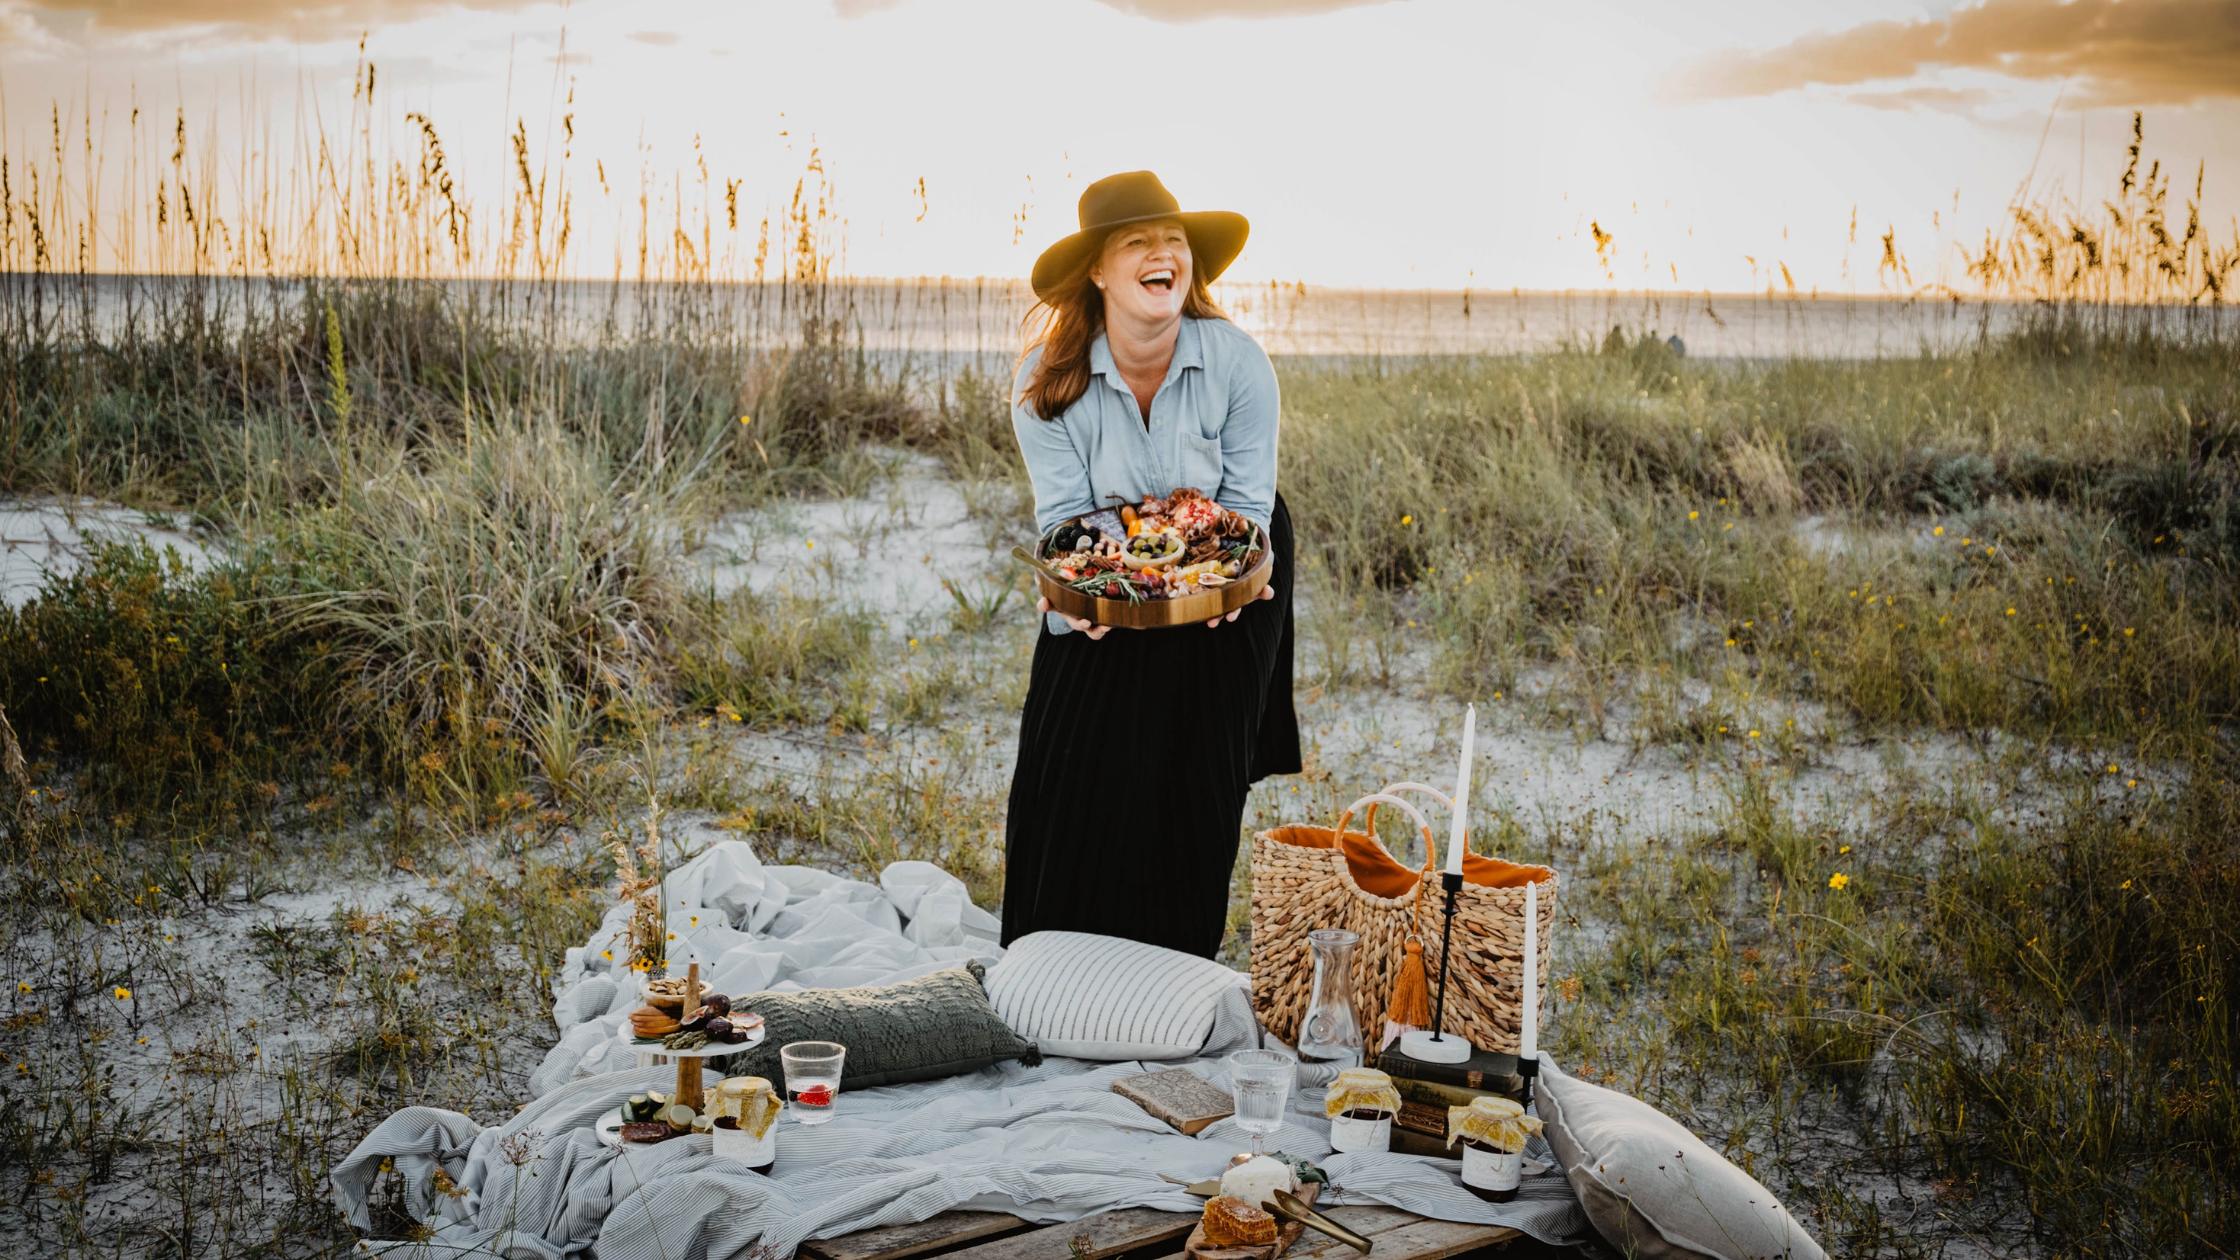 Traveling Tray - charcuterie entrepreneur beach picnic